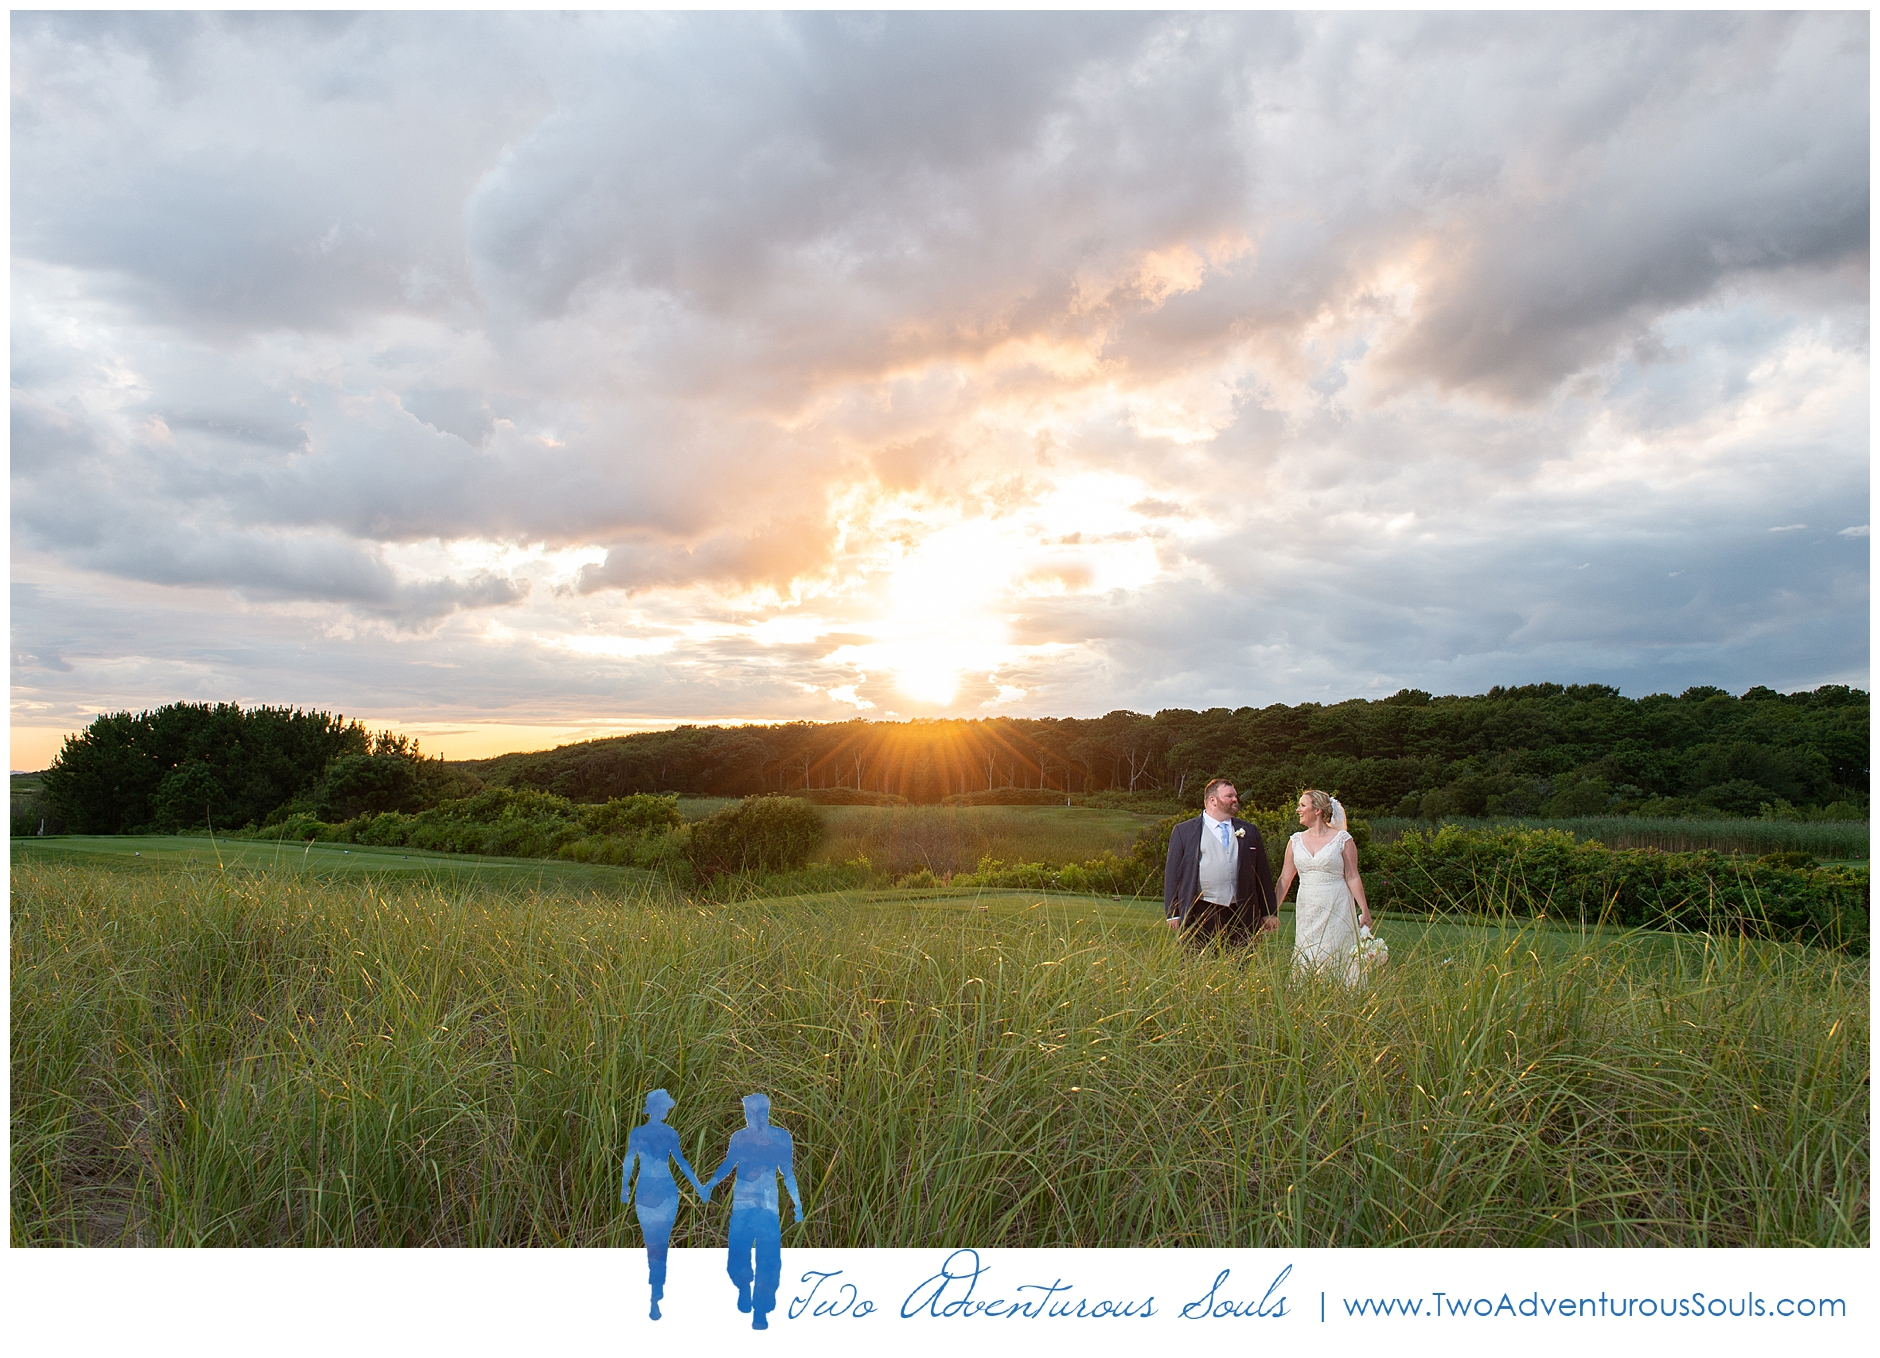 Cape Cod Wedding Photographers, Destination Wedding Photographers, Two Adventurous Souls-081019_0050.jpg